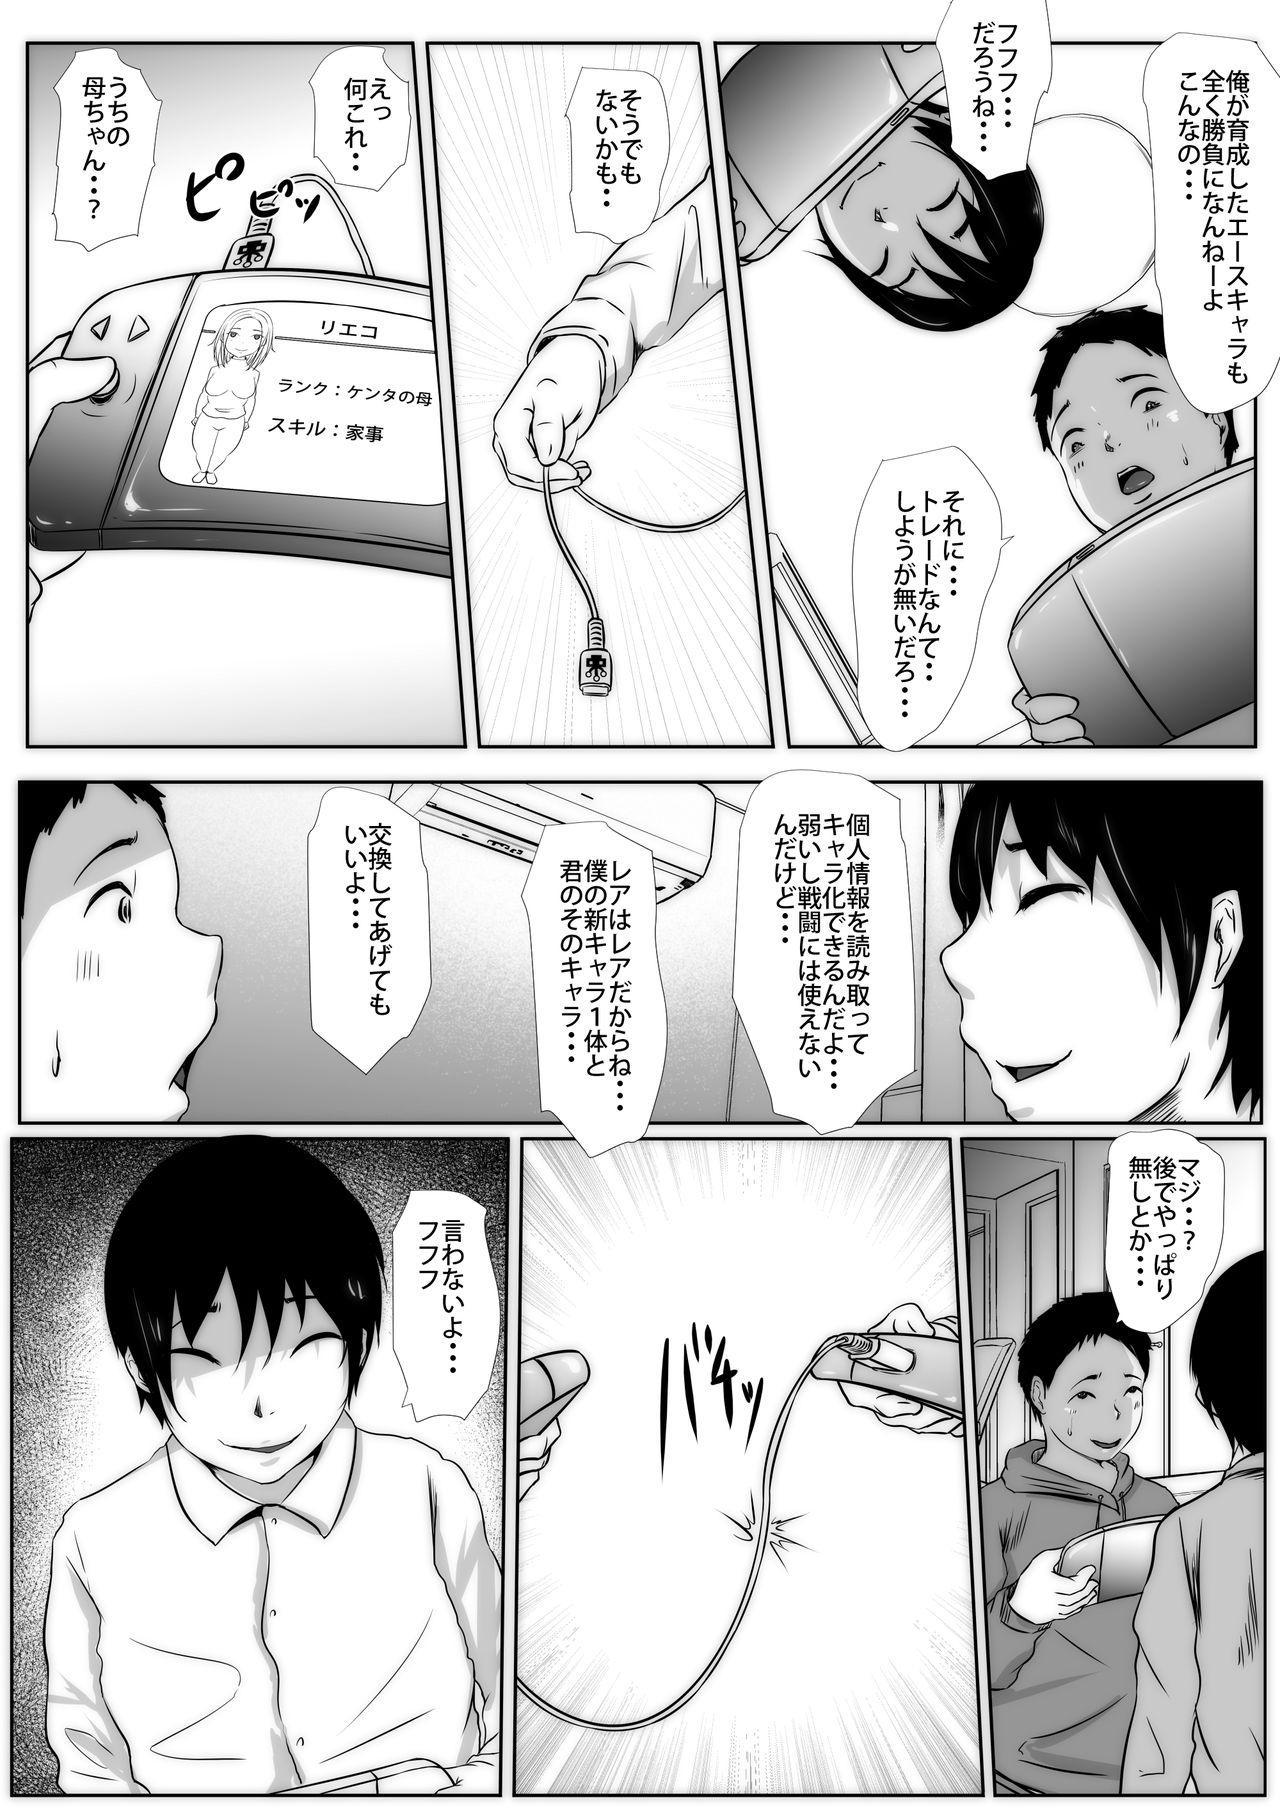 Hahaoya Trading, Friend Kyouyuu Ikusei NTR 4